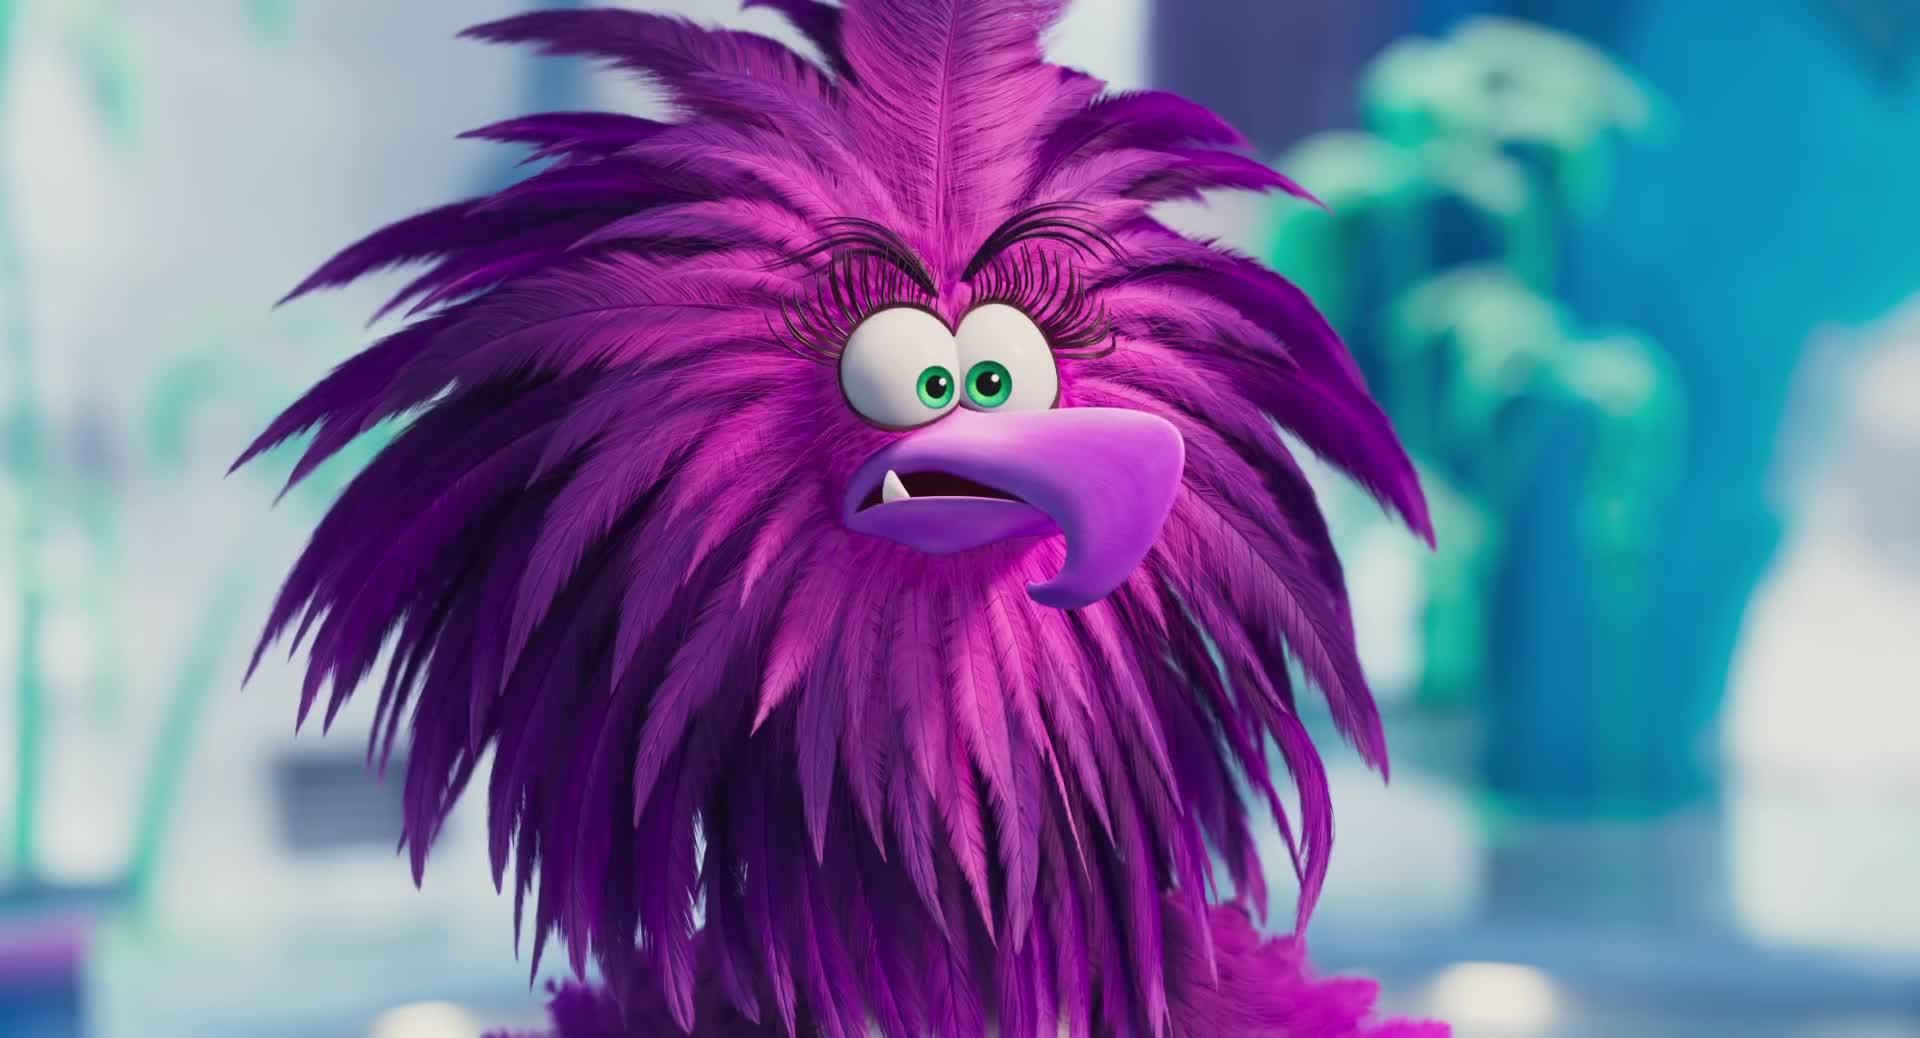 Trailer, Kino, Kinofilm, Teaser, Angry Birds, Sony Pictures, Sony Pictures Entertainment, The Angry Birds Movie 2, Angry Birds Movie 2